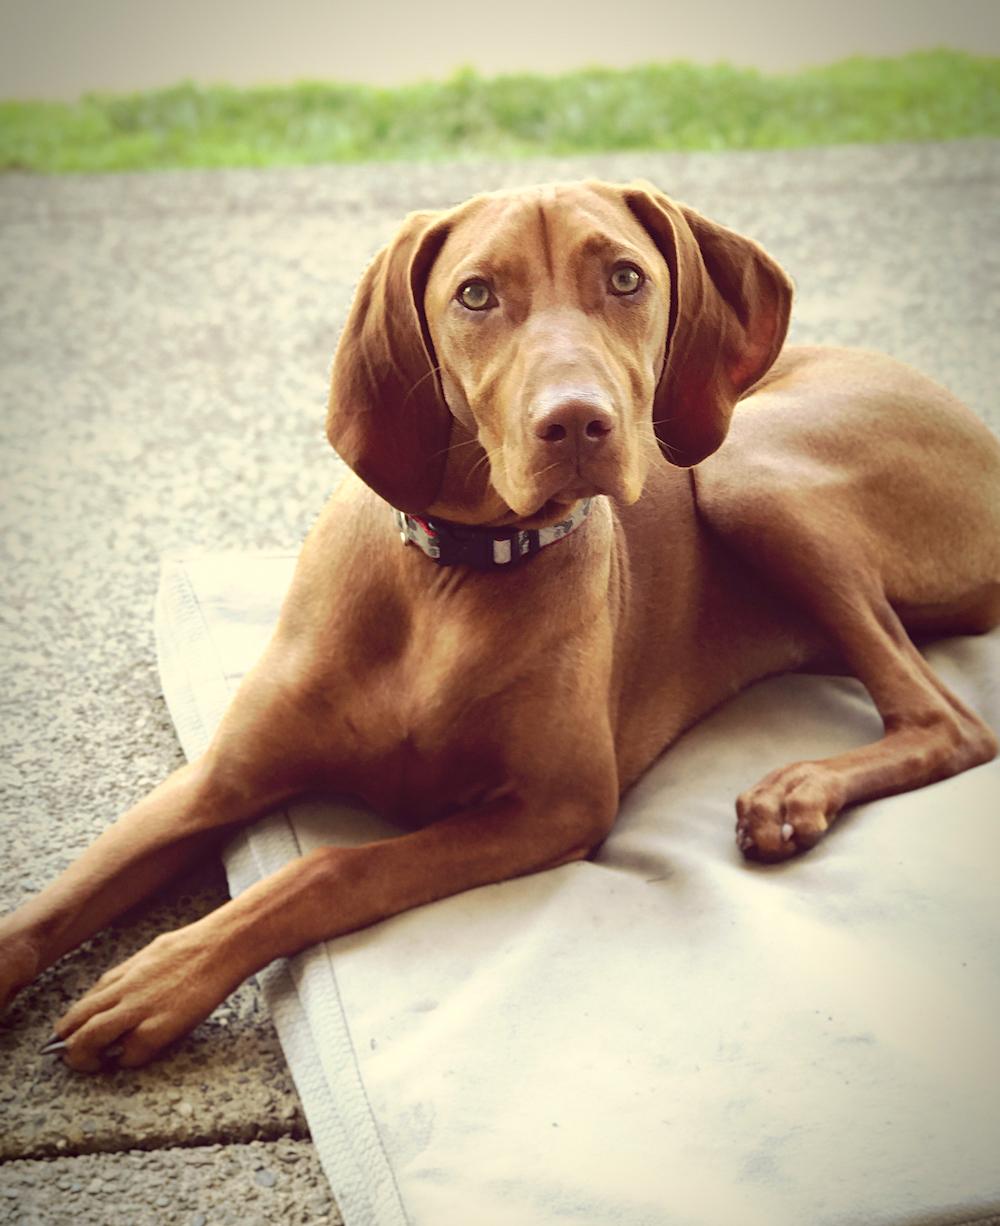 Vizsla puppy on dog bed